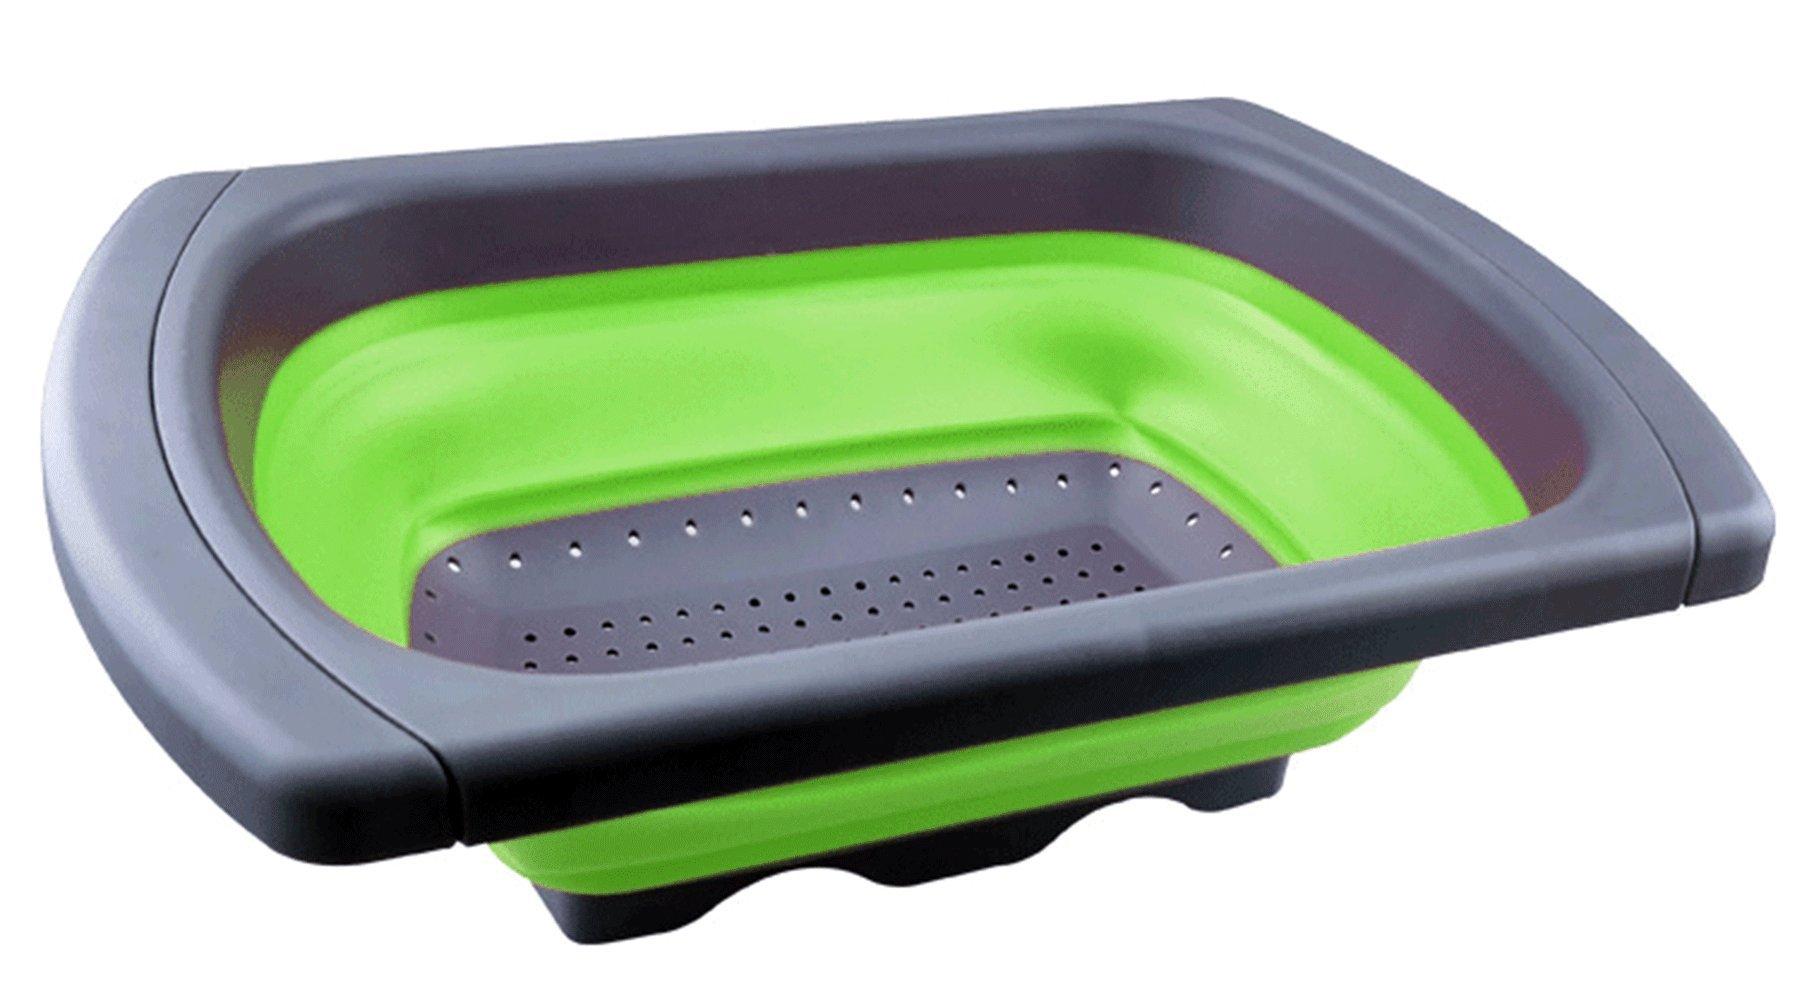 HI-QUAL Colander Collapsible,Collapsible Over the Sink Colander/Strainer,Folding Strainer for Kitchen,Over the Sink Colander with Handles,Capacity of 6 quart-Green